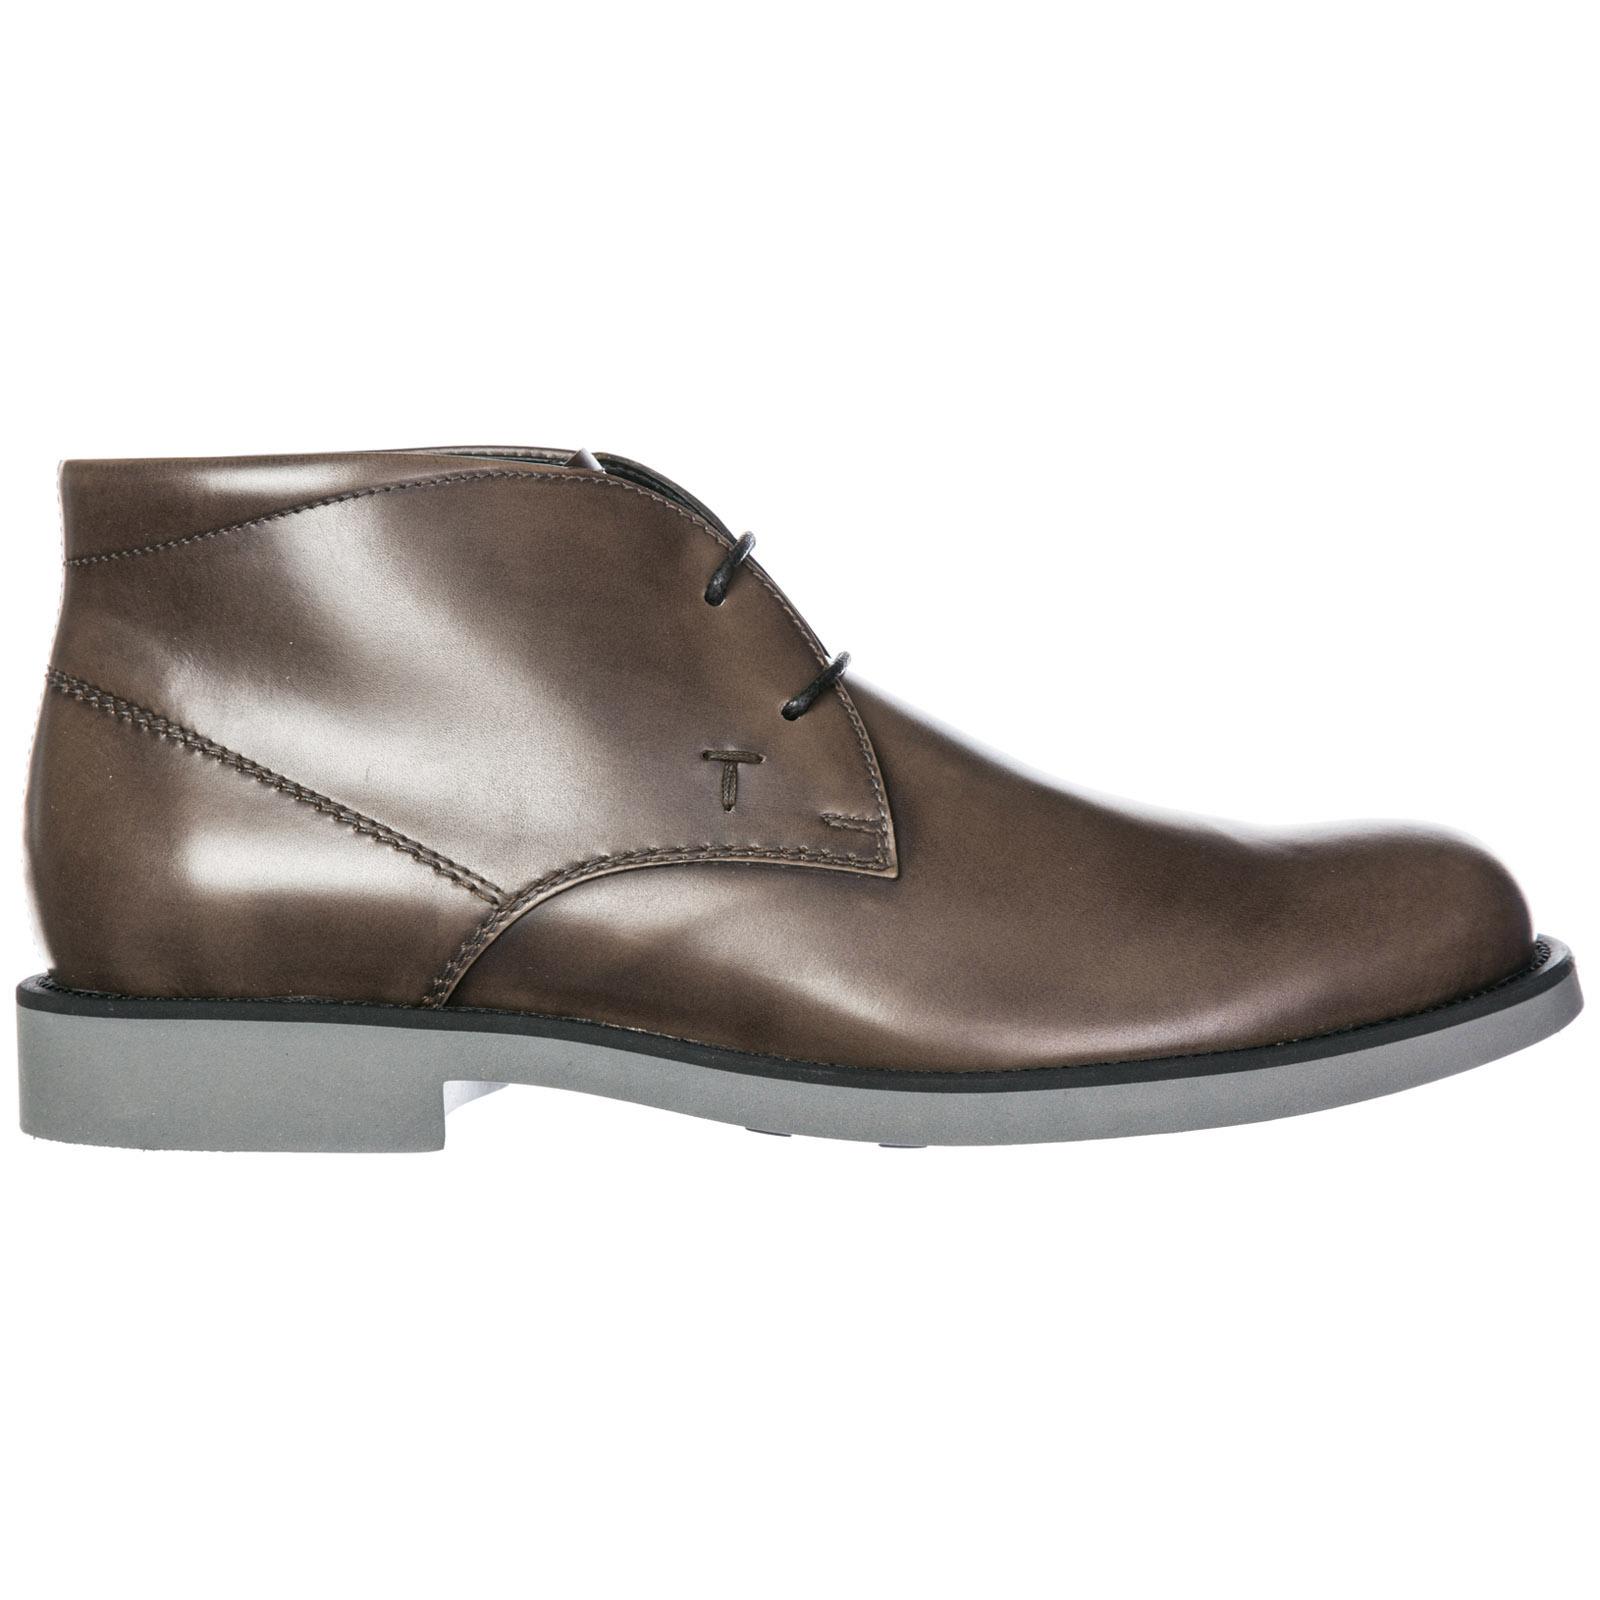 ac73d29e6d Polacchine stivaletti scarpe uomo pelle